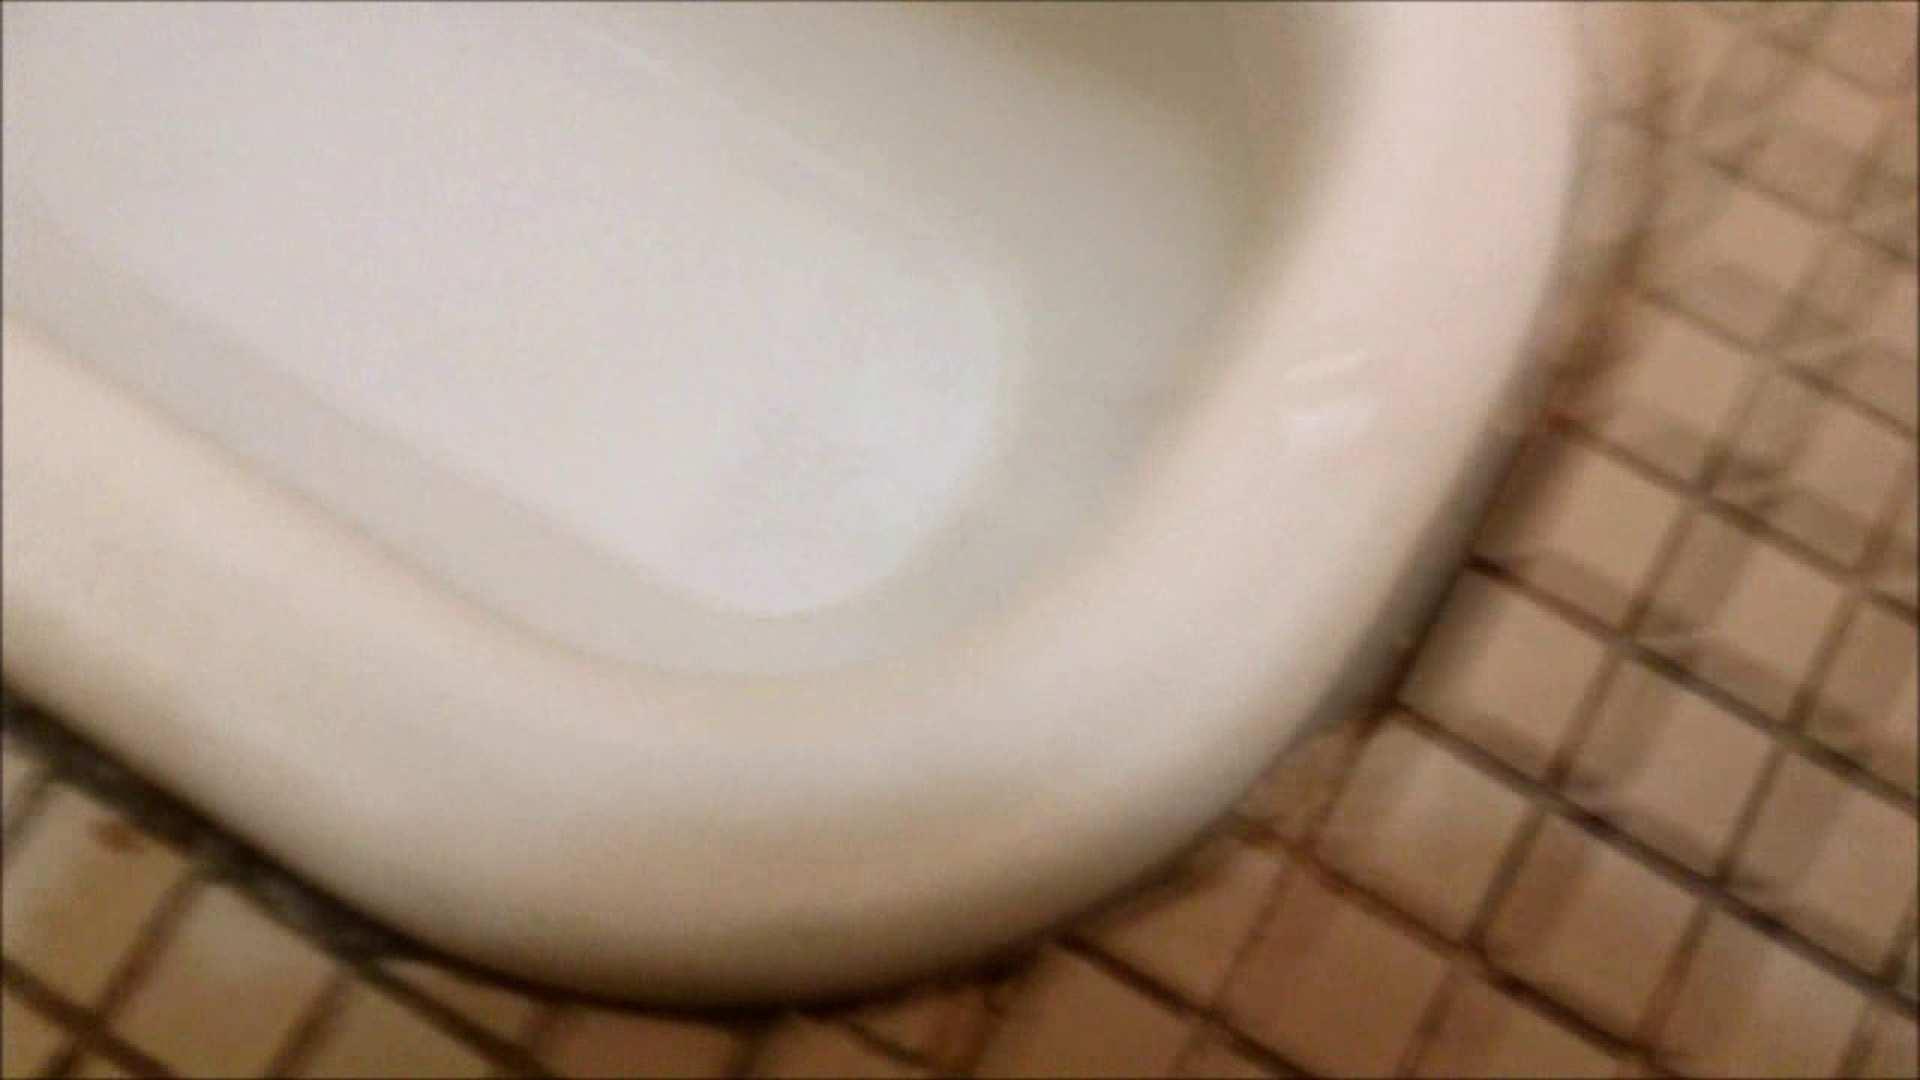 某有名大学女性洗面所 vol.11 和式 | 潜入 のぞき 85PIX 16